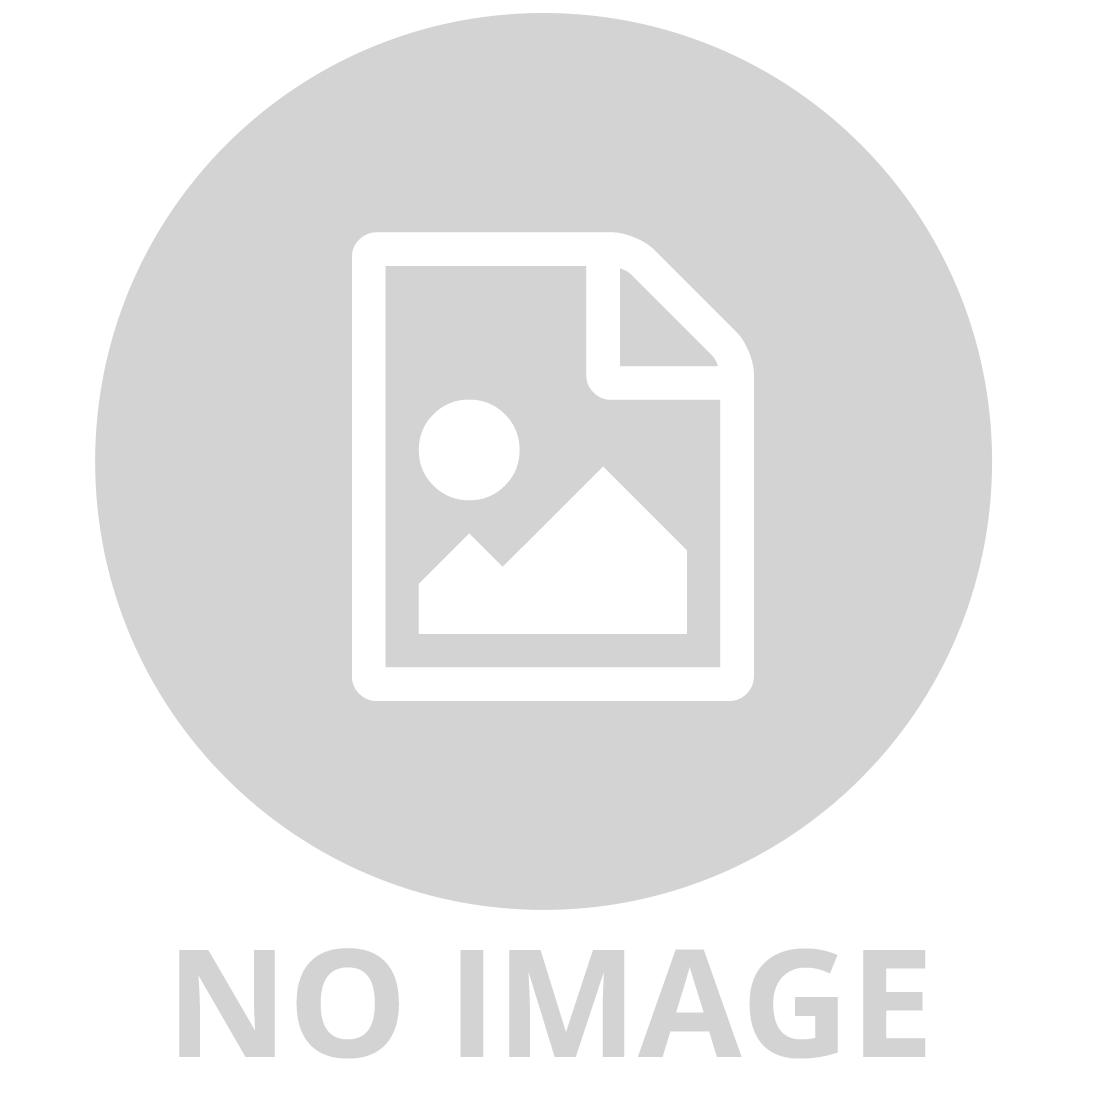 PLAYGRO BATH BOOK LITTLE BEE'S ADVENTURE